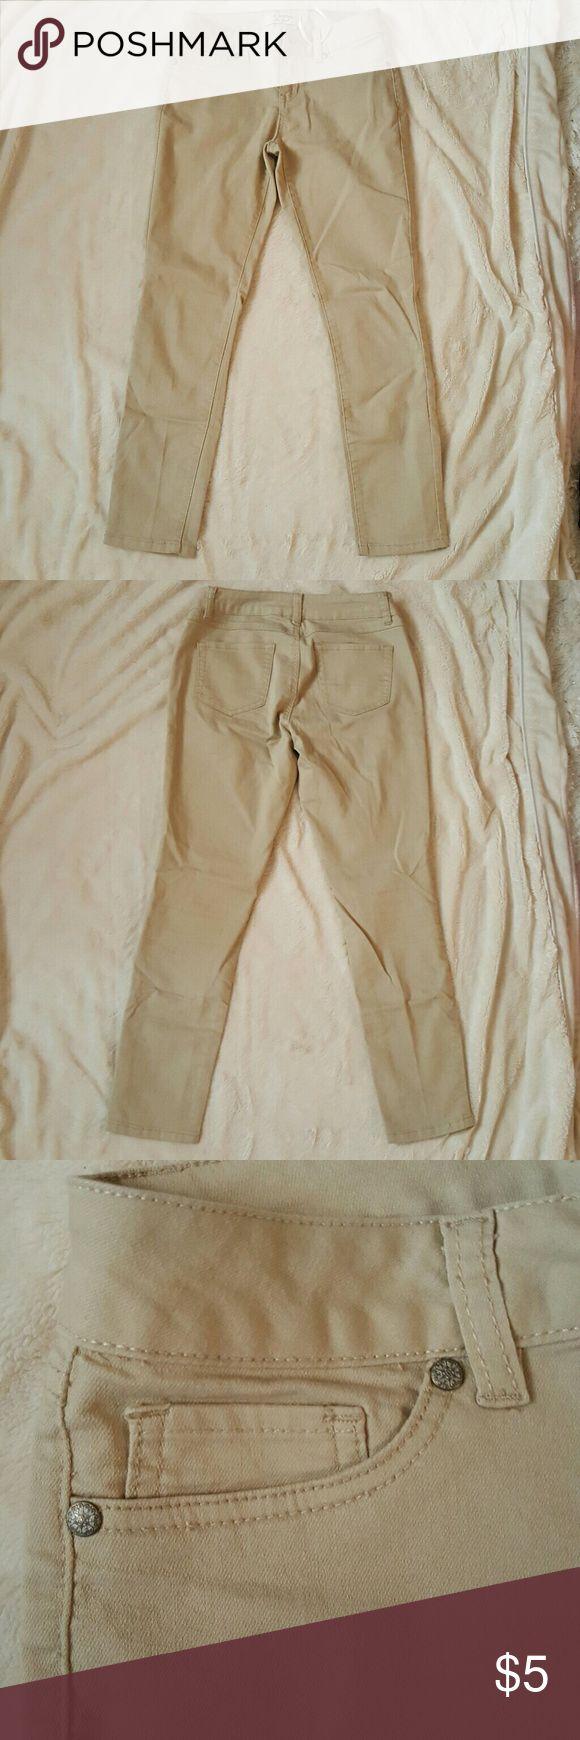 Skinny khaki pants Lightweight, thin, stretchy skinny khaki pants. 70% cotton/28% polyester/2% spandex Pants Skinny